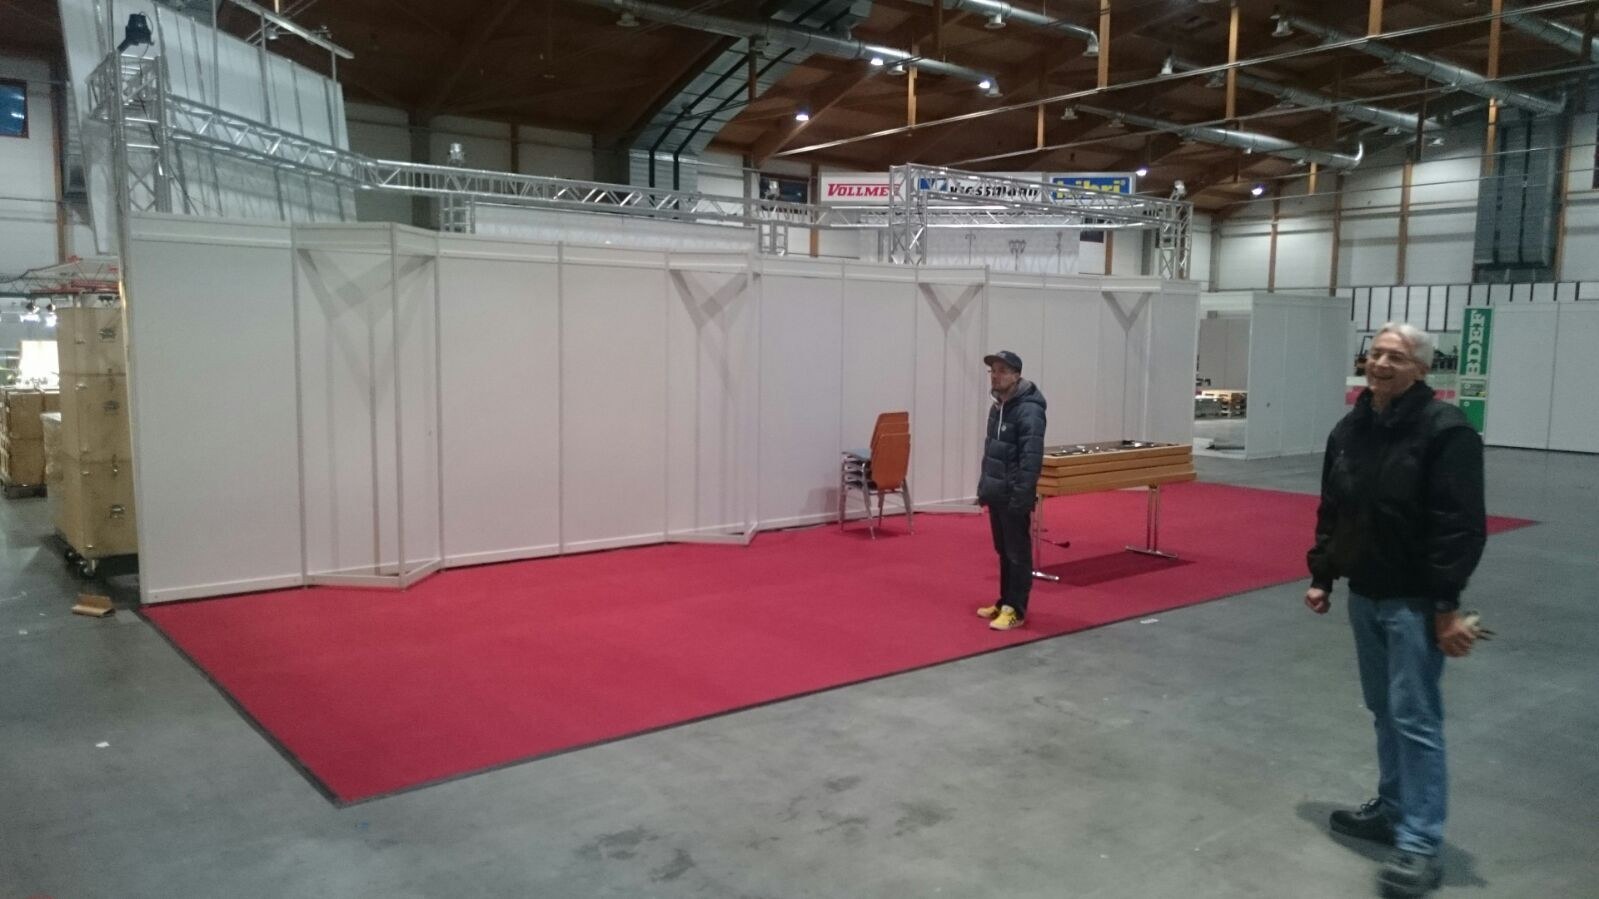 Eisenbahnfreunde Kraichgau Faszination Modellbahn 2016 Standaufbau Messe 01